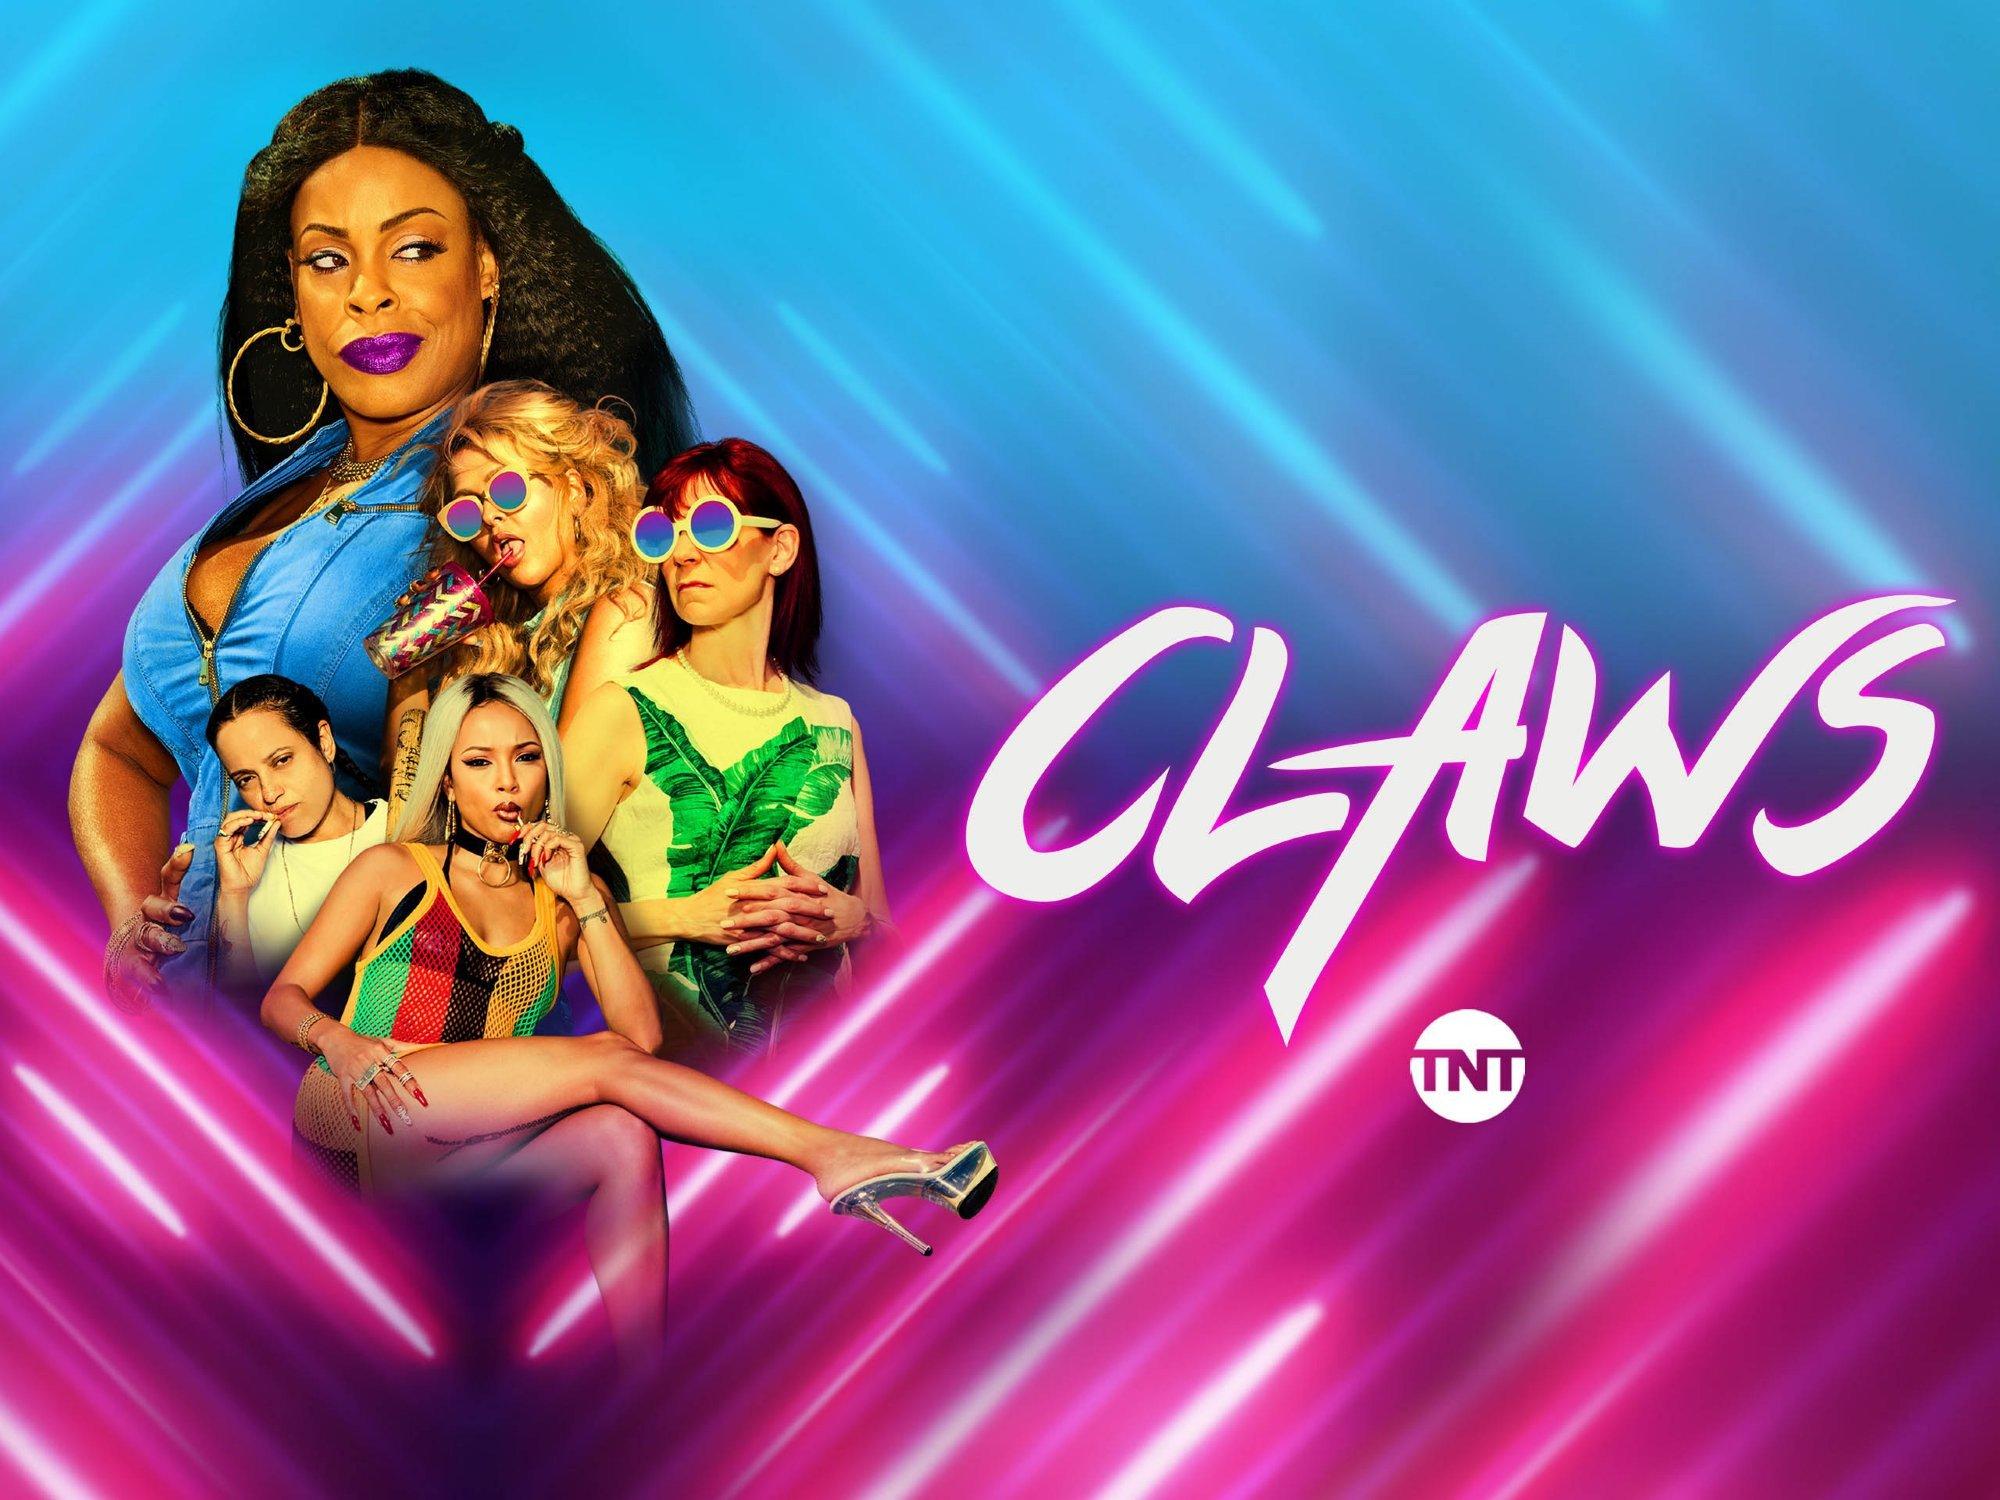 Watch Claws Season 2 Prime Video